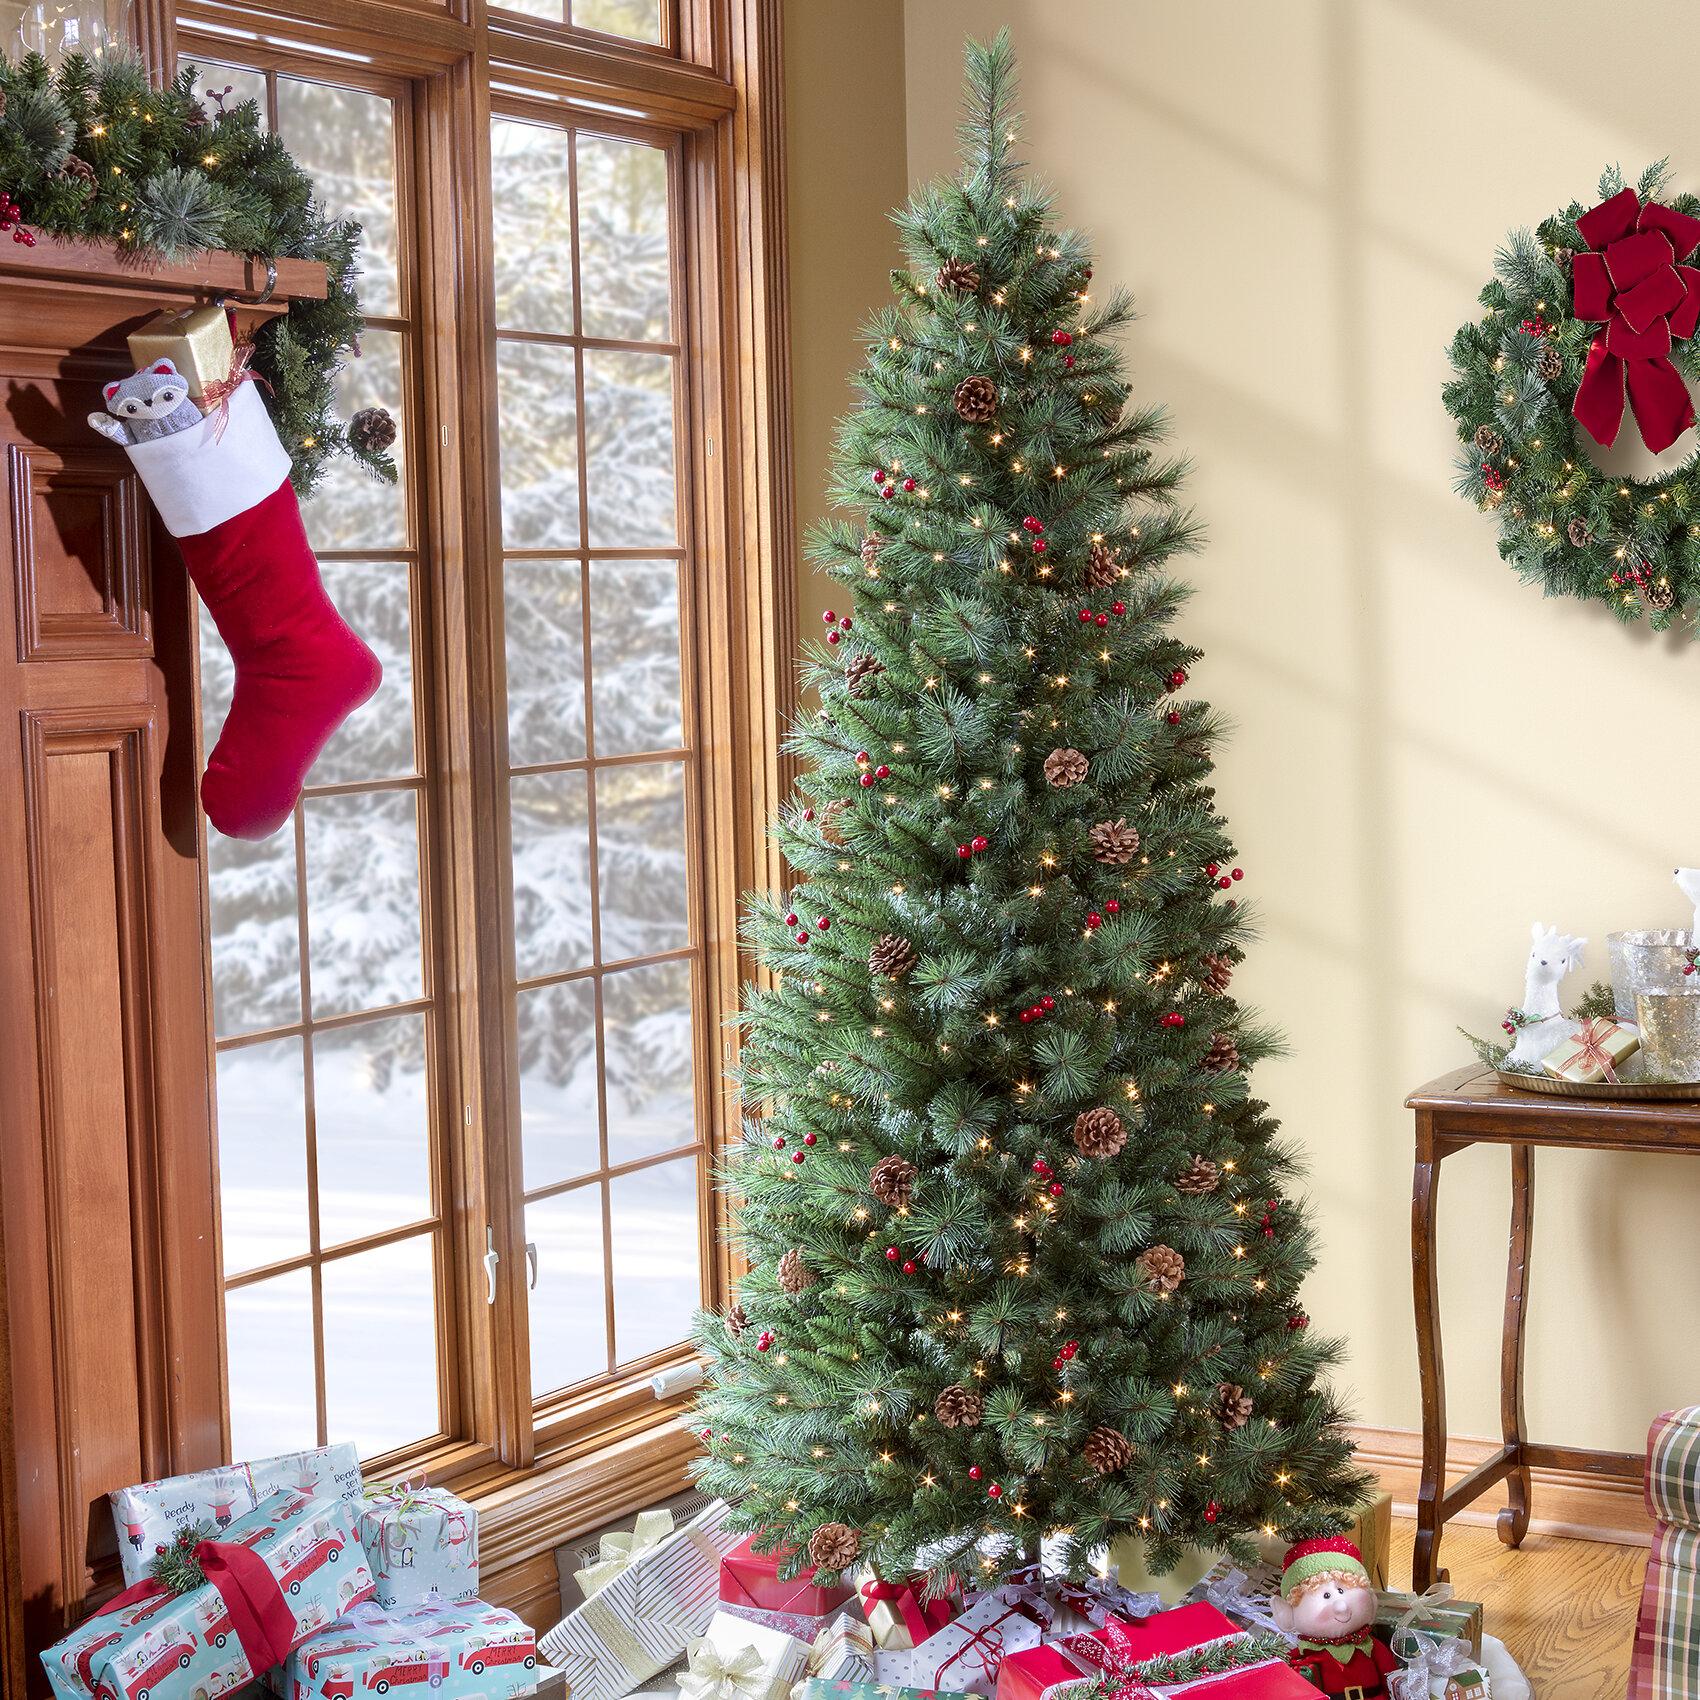 Haute Decor Newbury Easy Stow 6 5 Green Pine Artificial Christmas Tree 300 Warm White Lights Reviews Wayfair